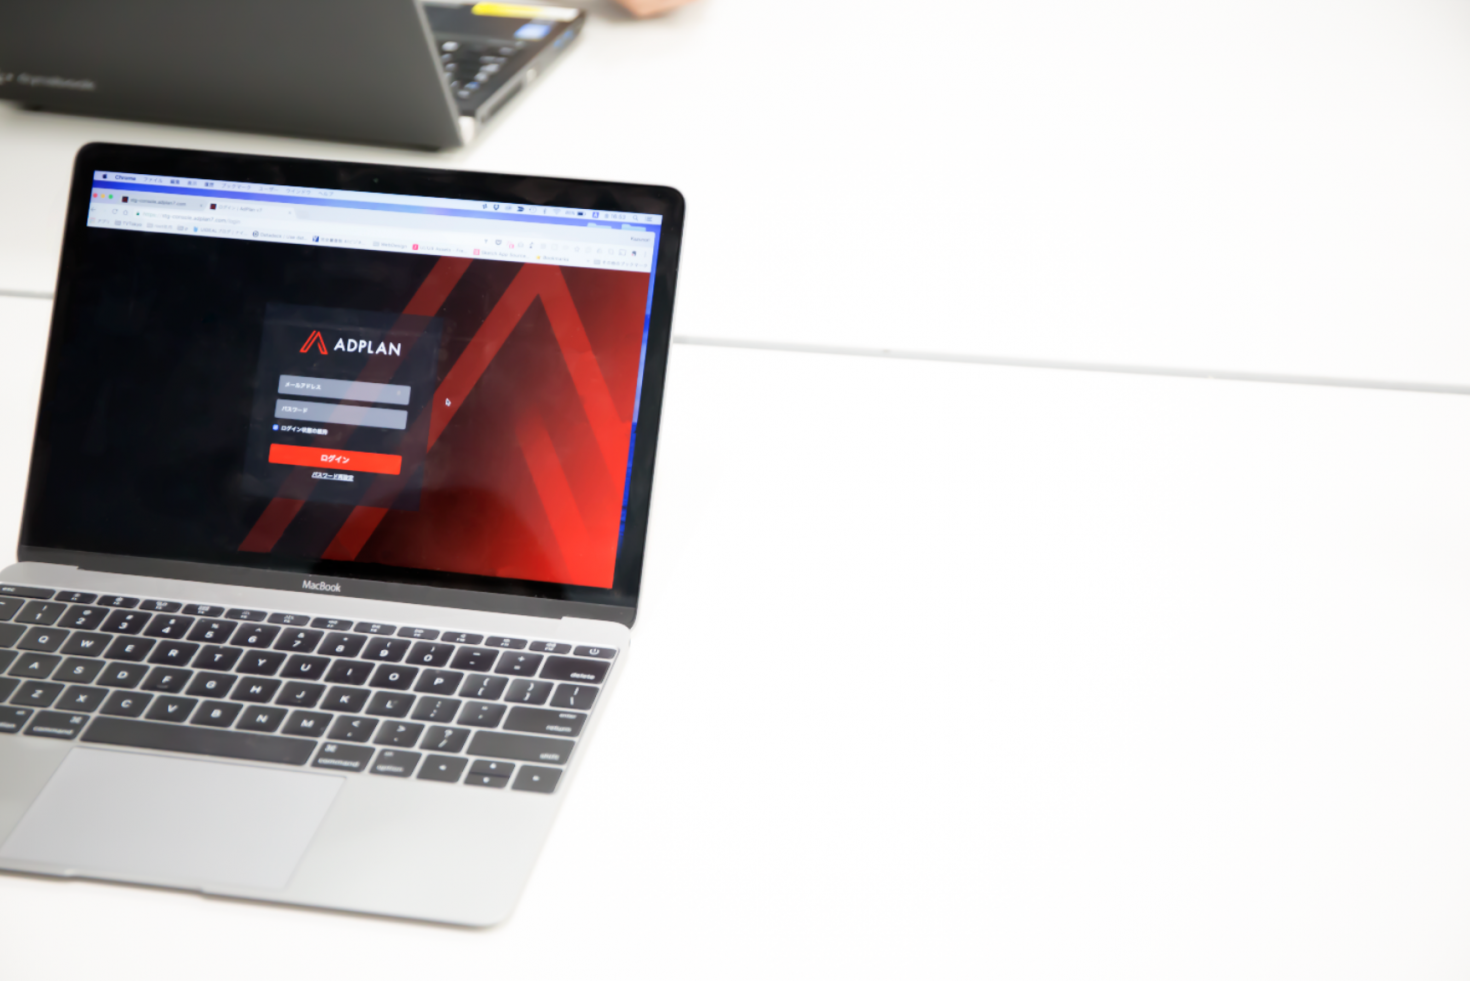 ADPLANのログイン画面